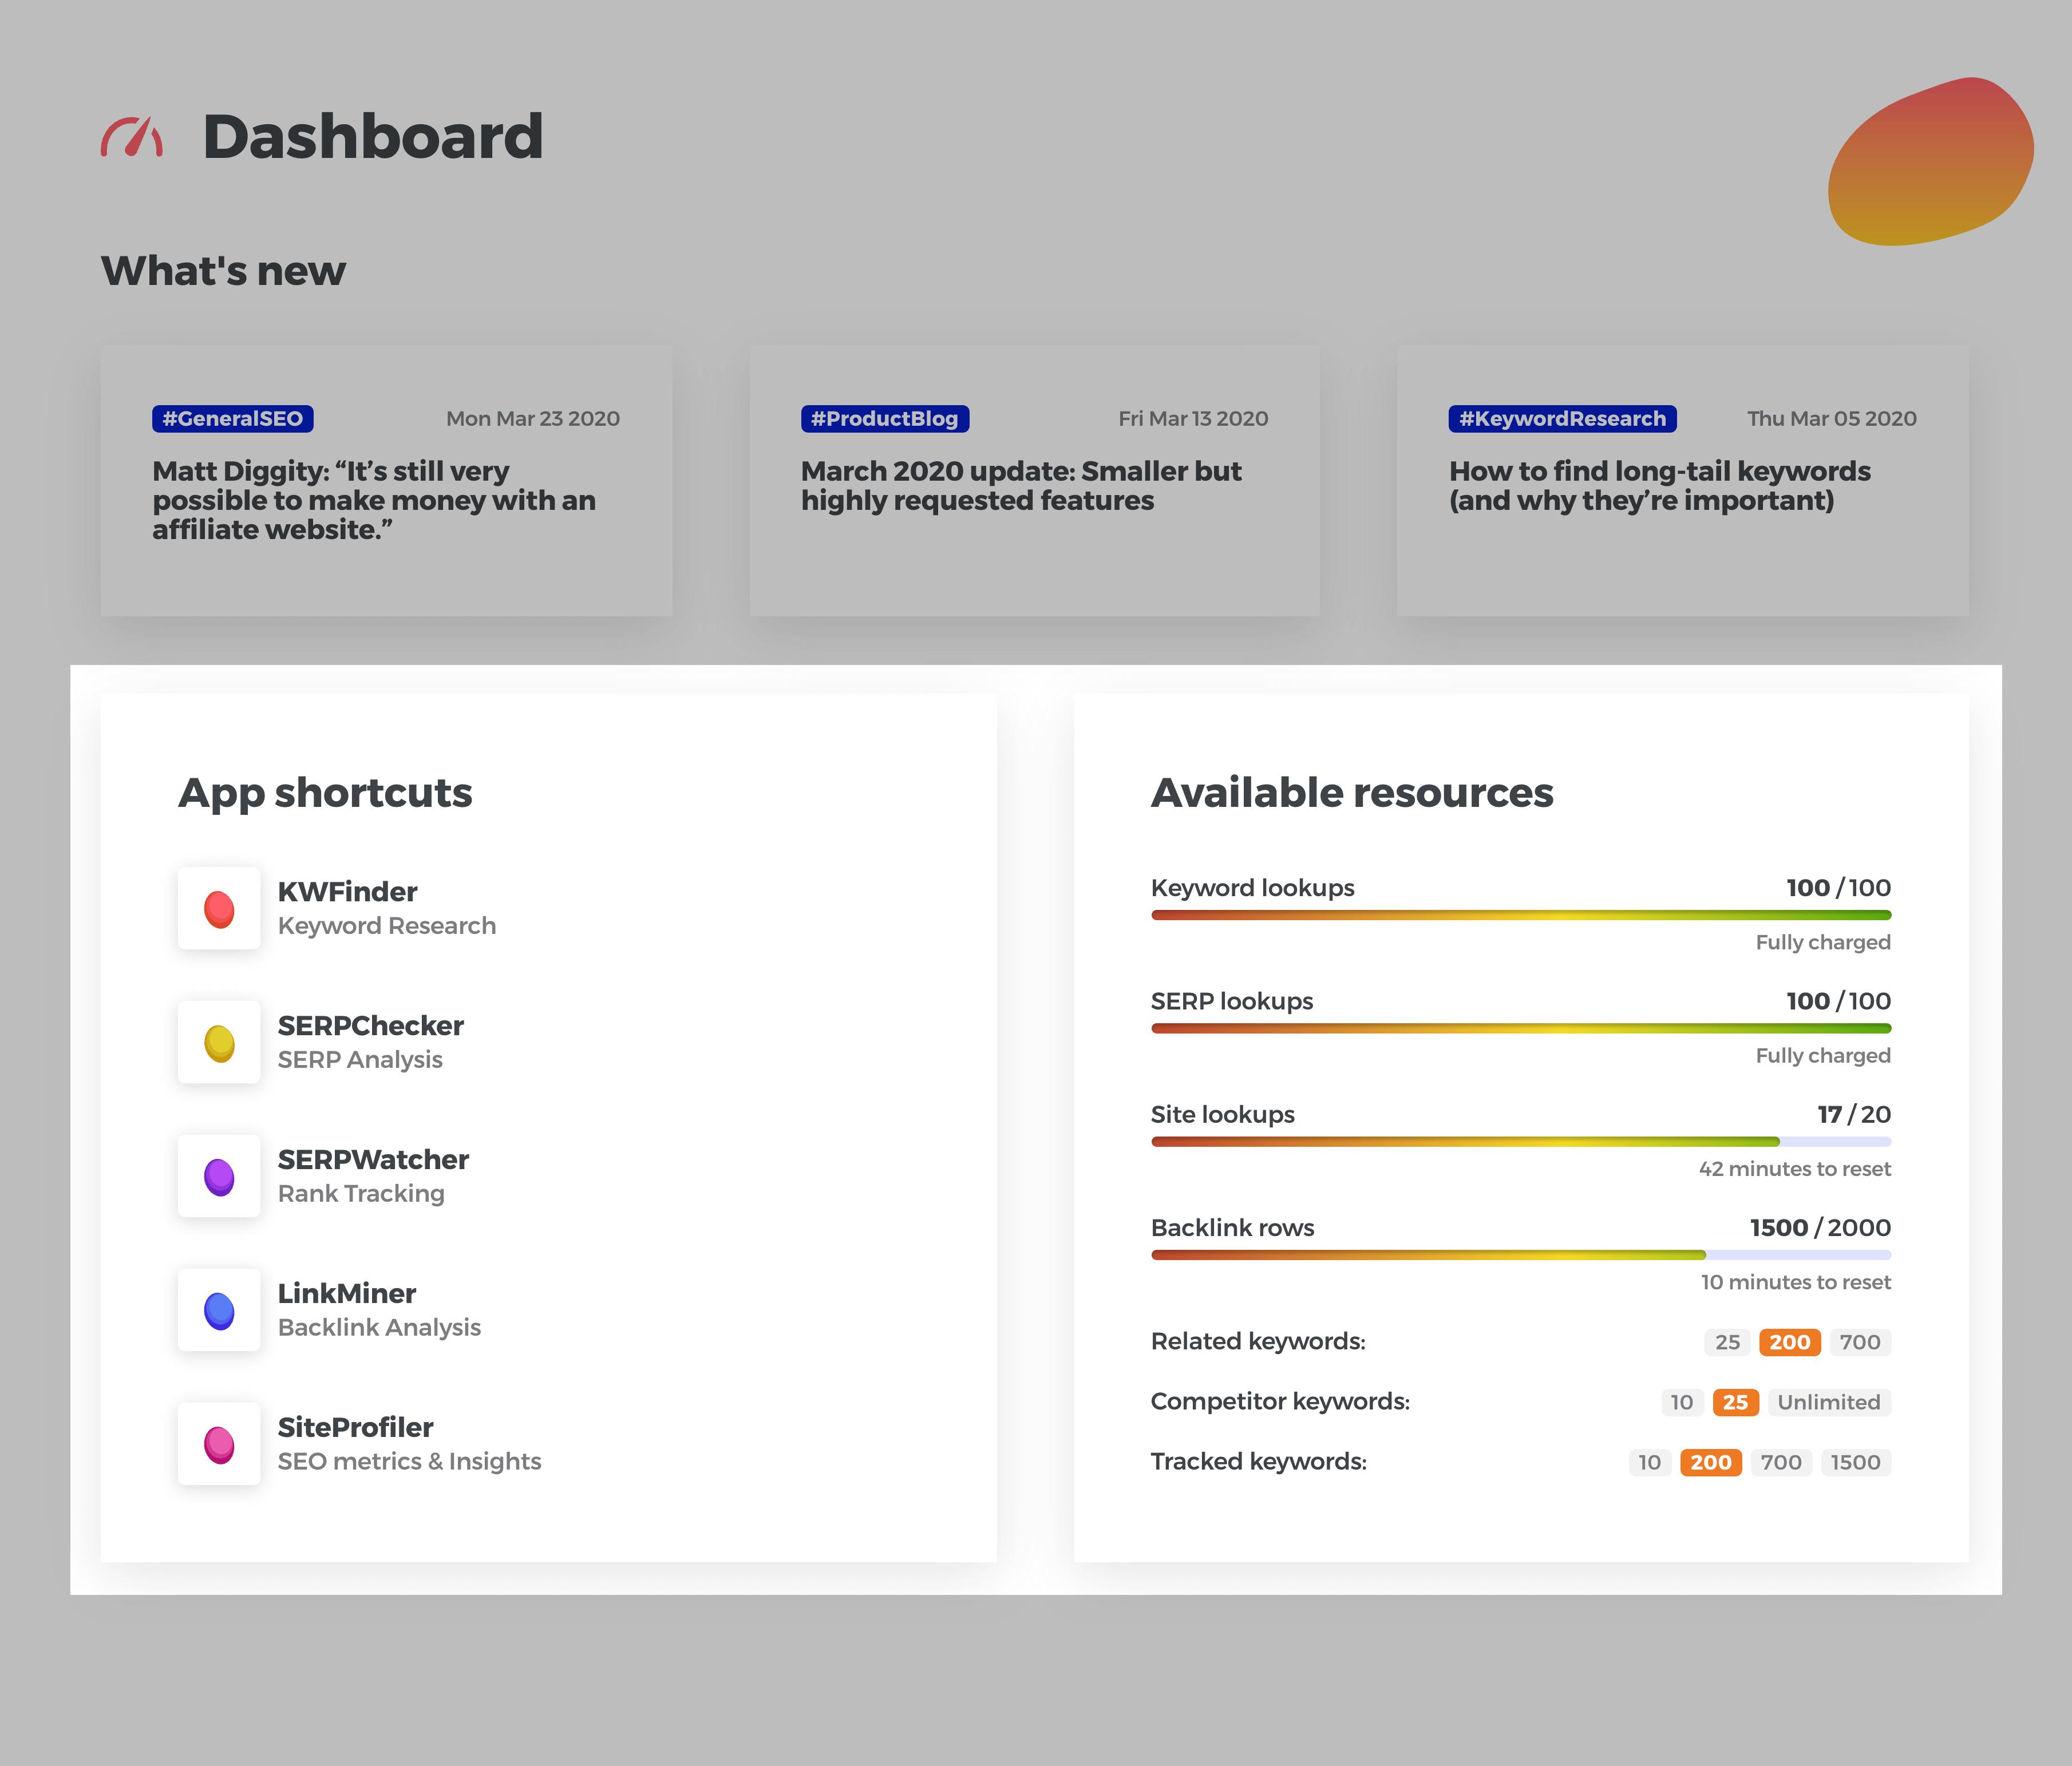 Mangools Dashboard – Resources